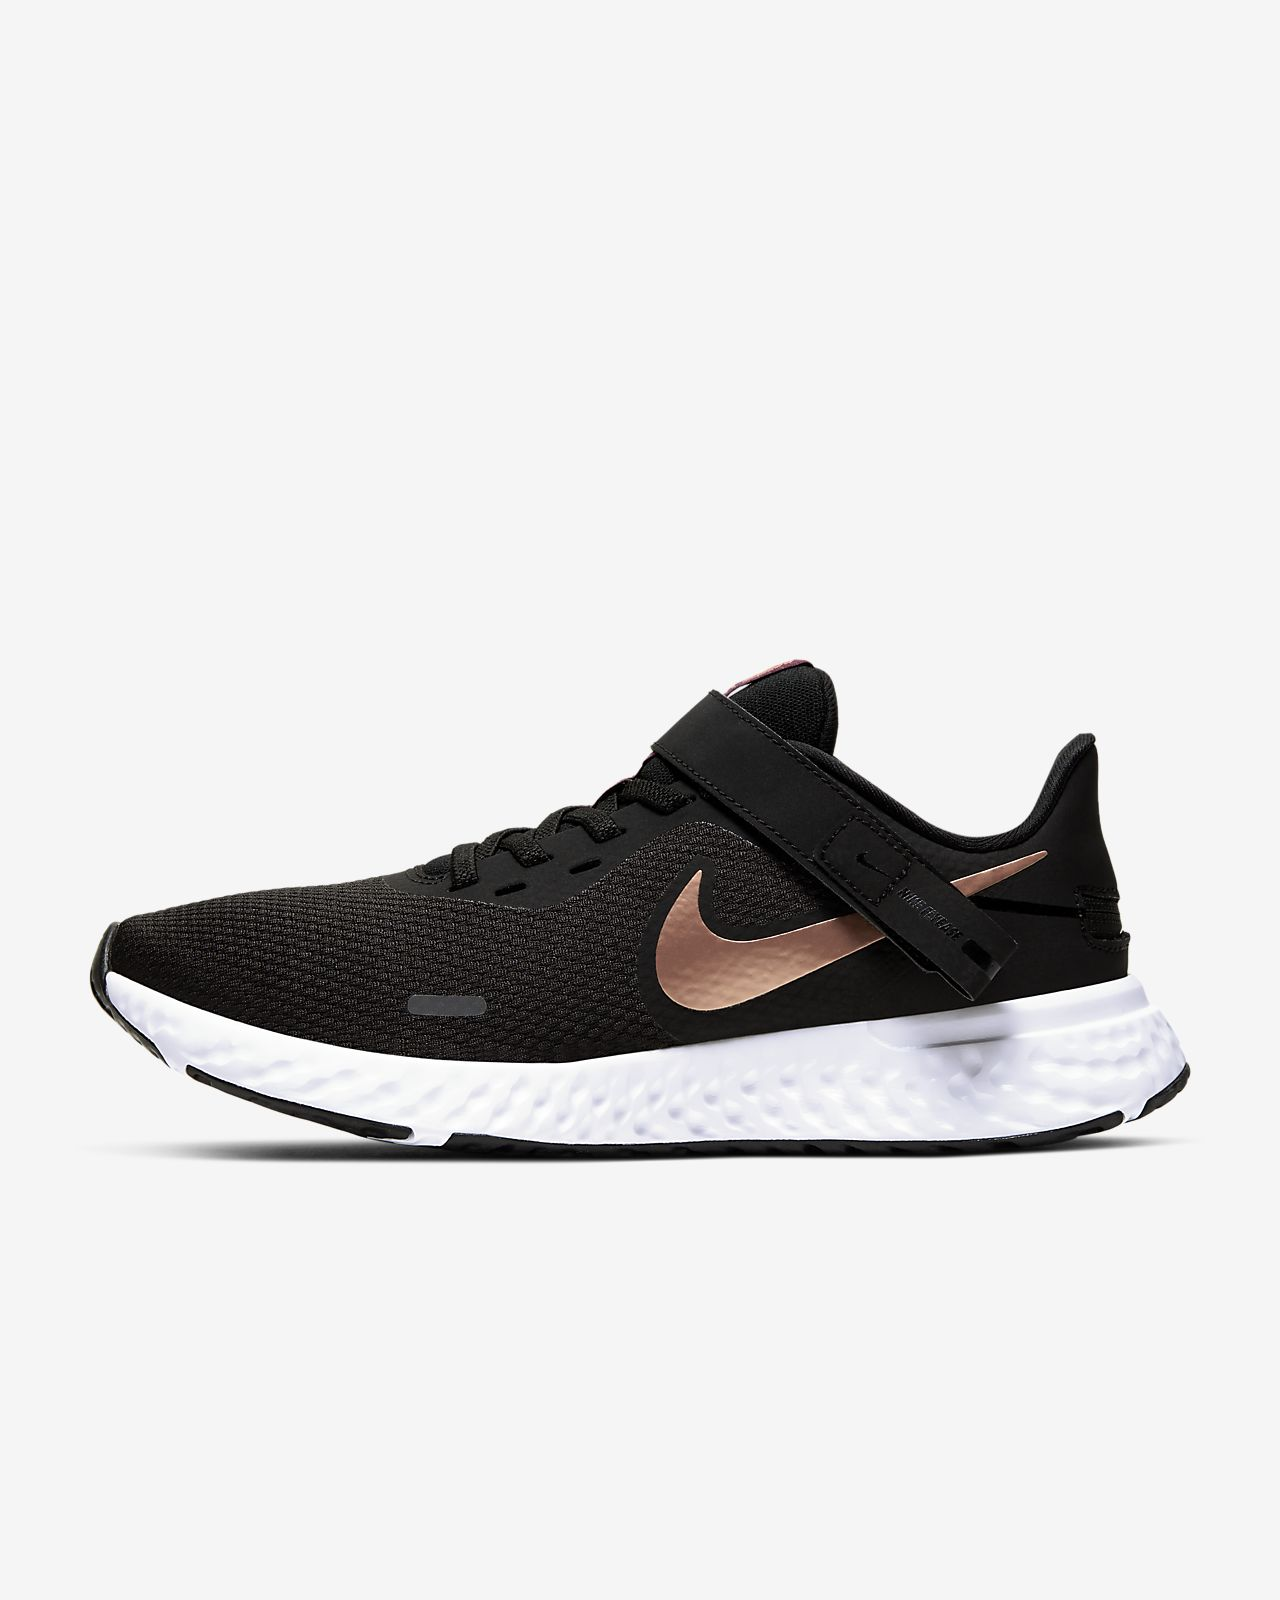 Dámská běžecká bota Nike Revolution 5 FlyEase